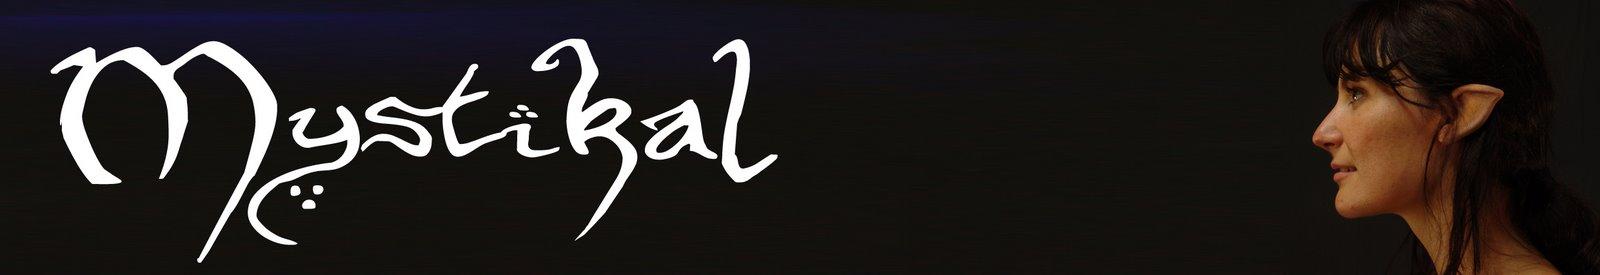 Mystikal - The movie